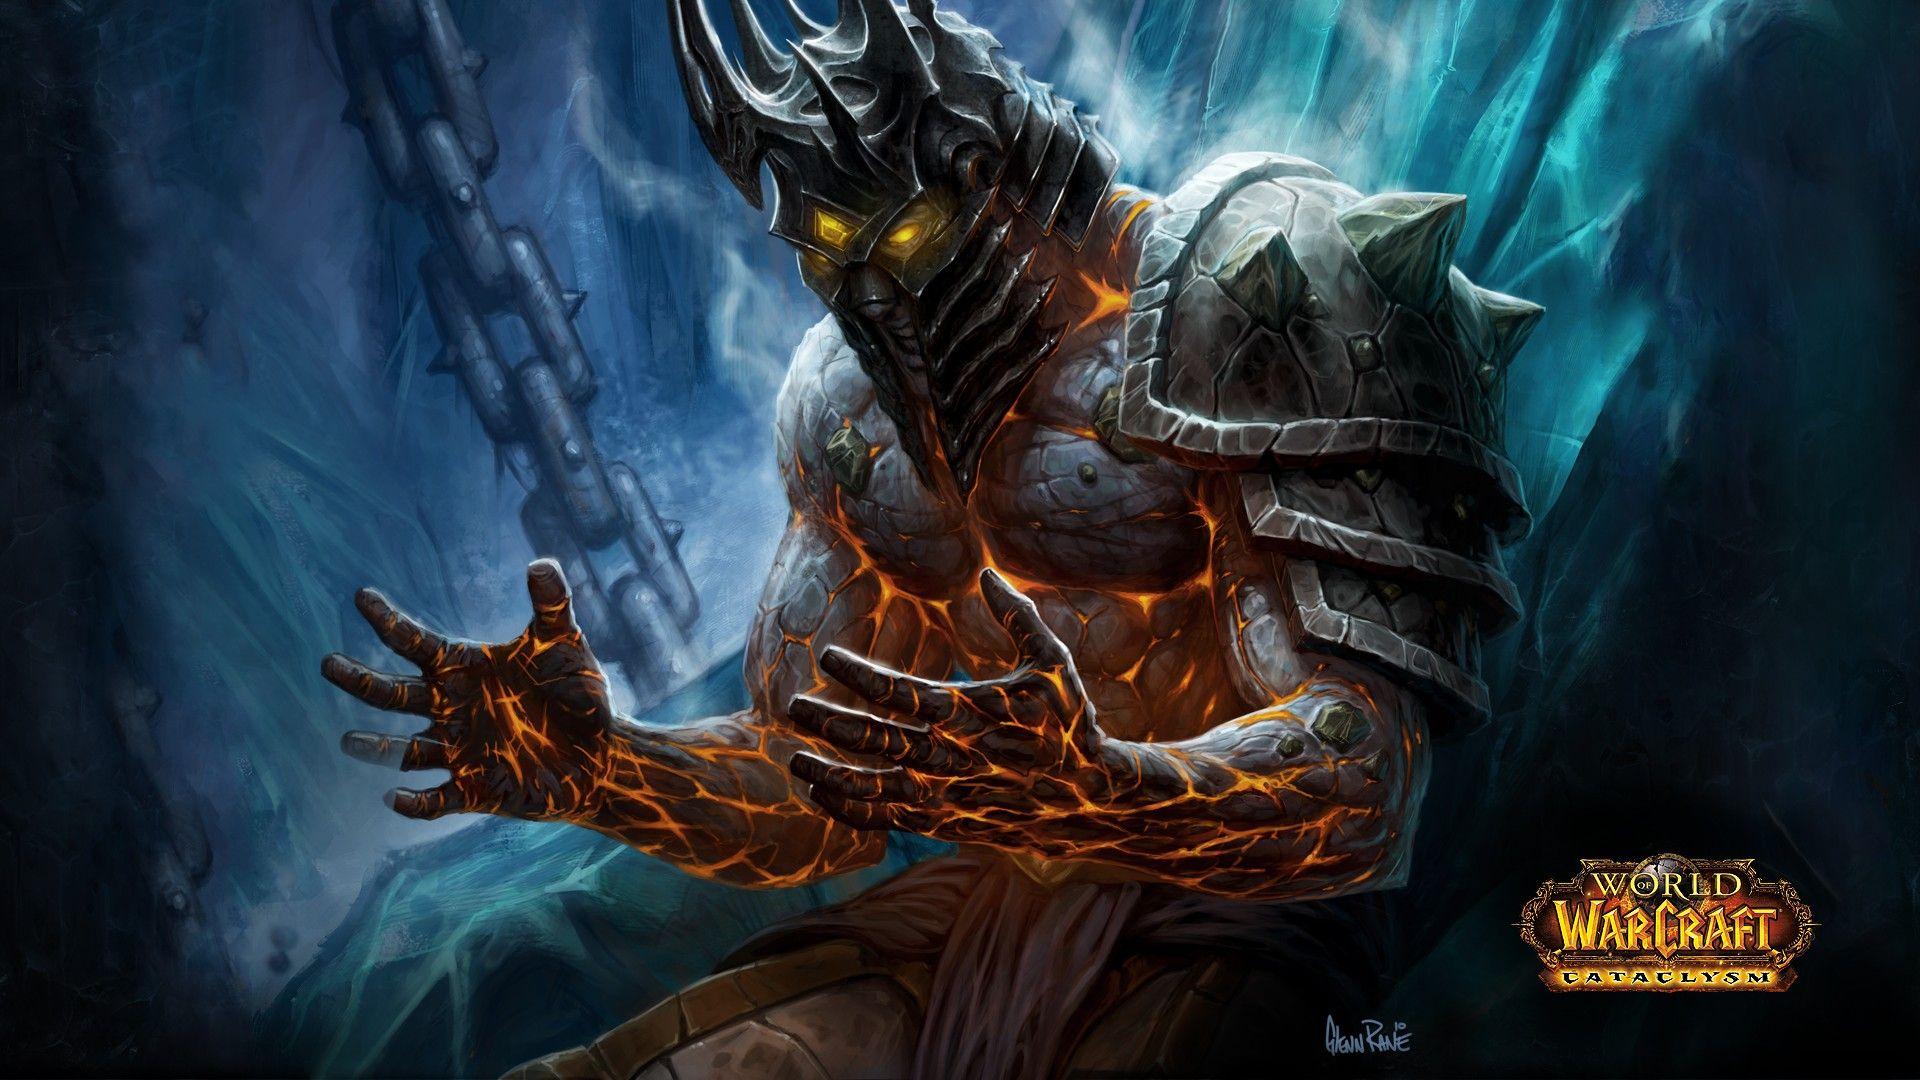 World of Warcraft wallpapers World of warcraft, World of